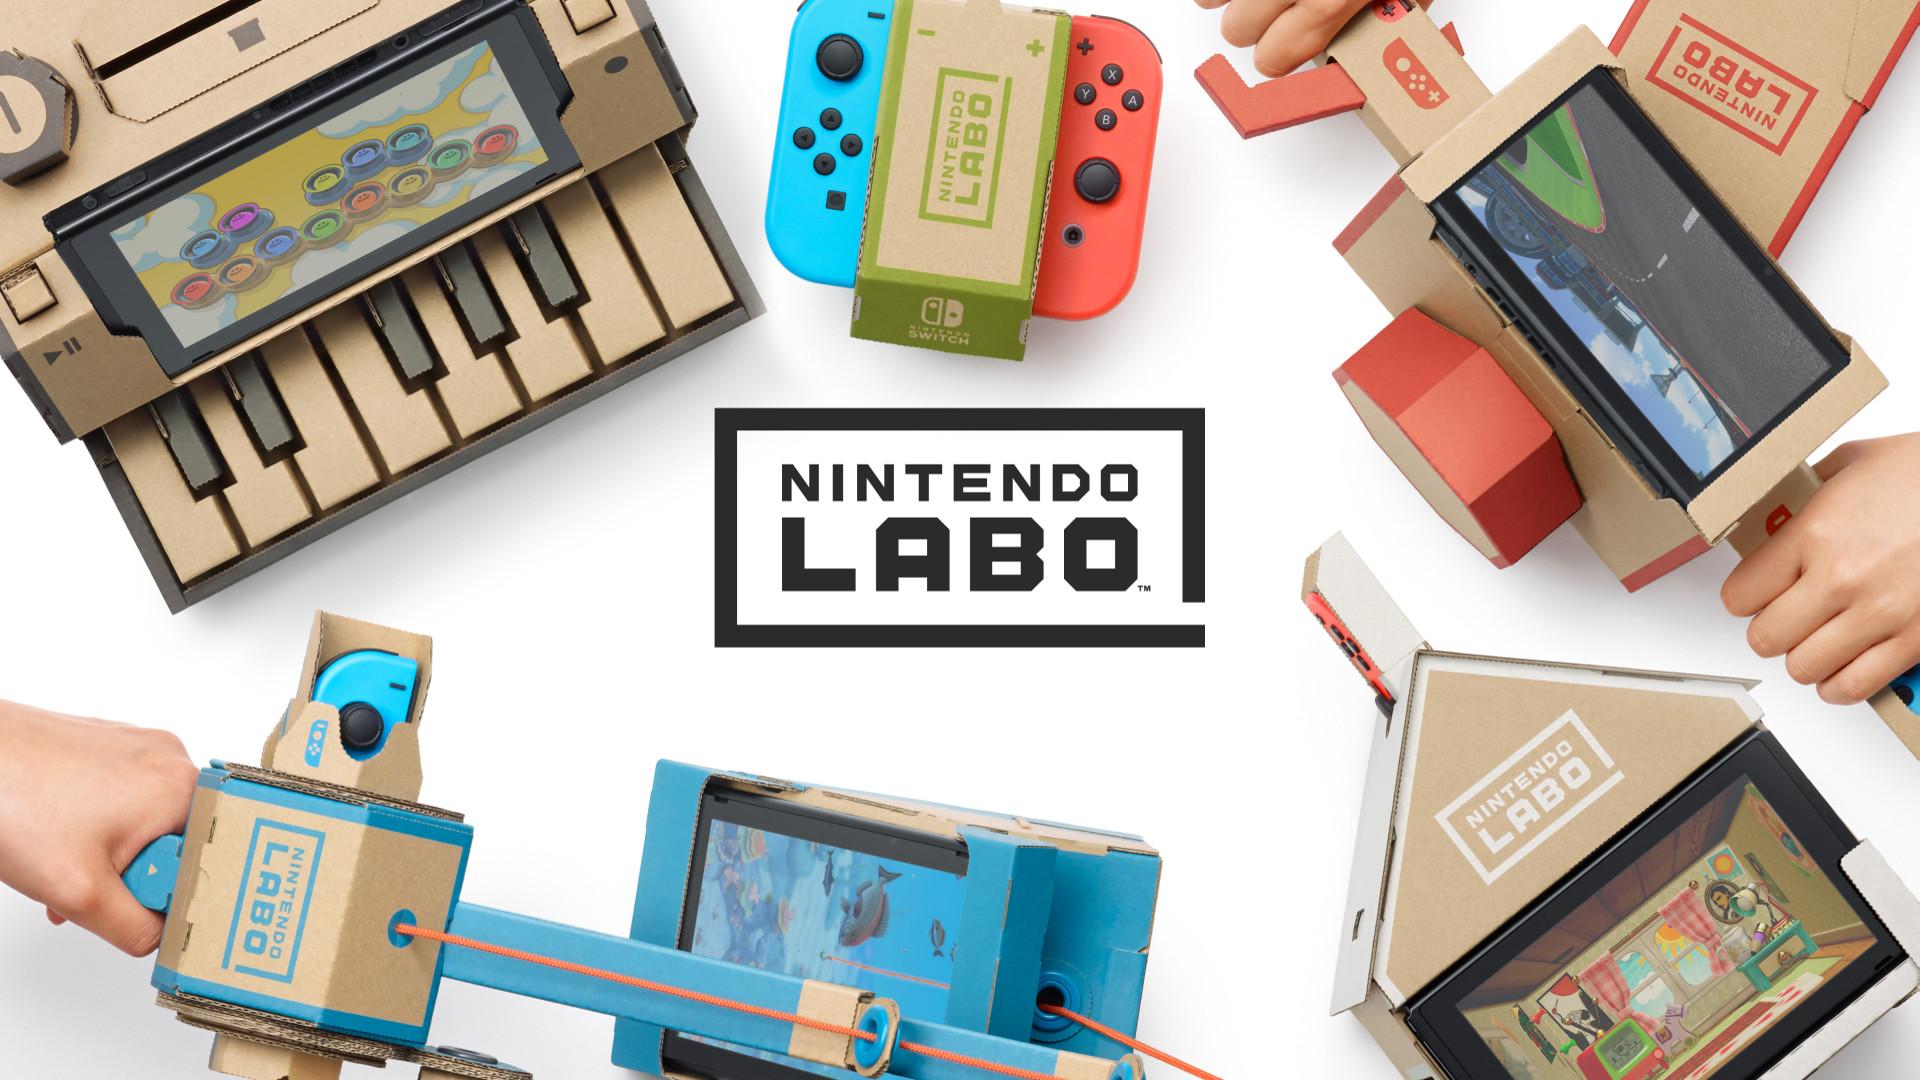 Image result for Nintendo Labo 1920x1080